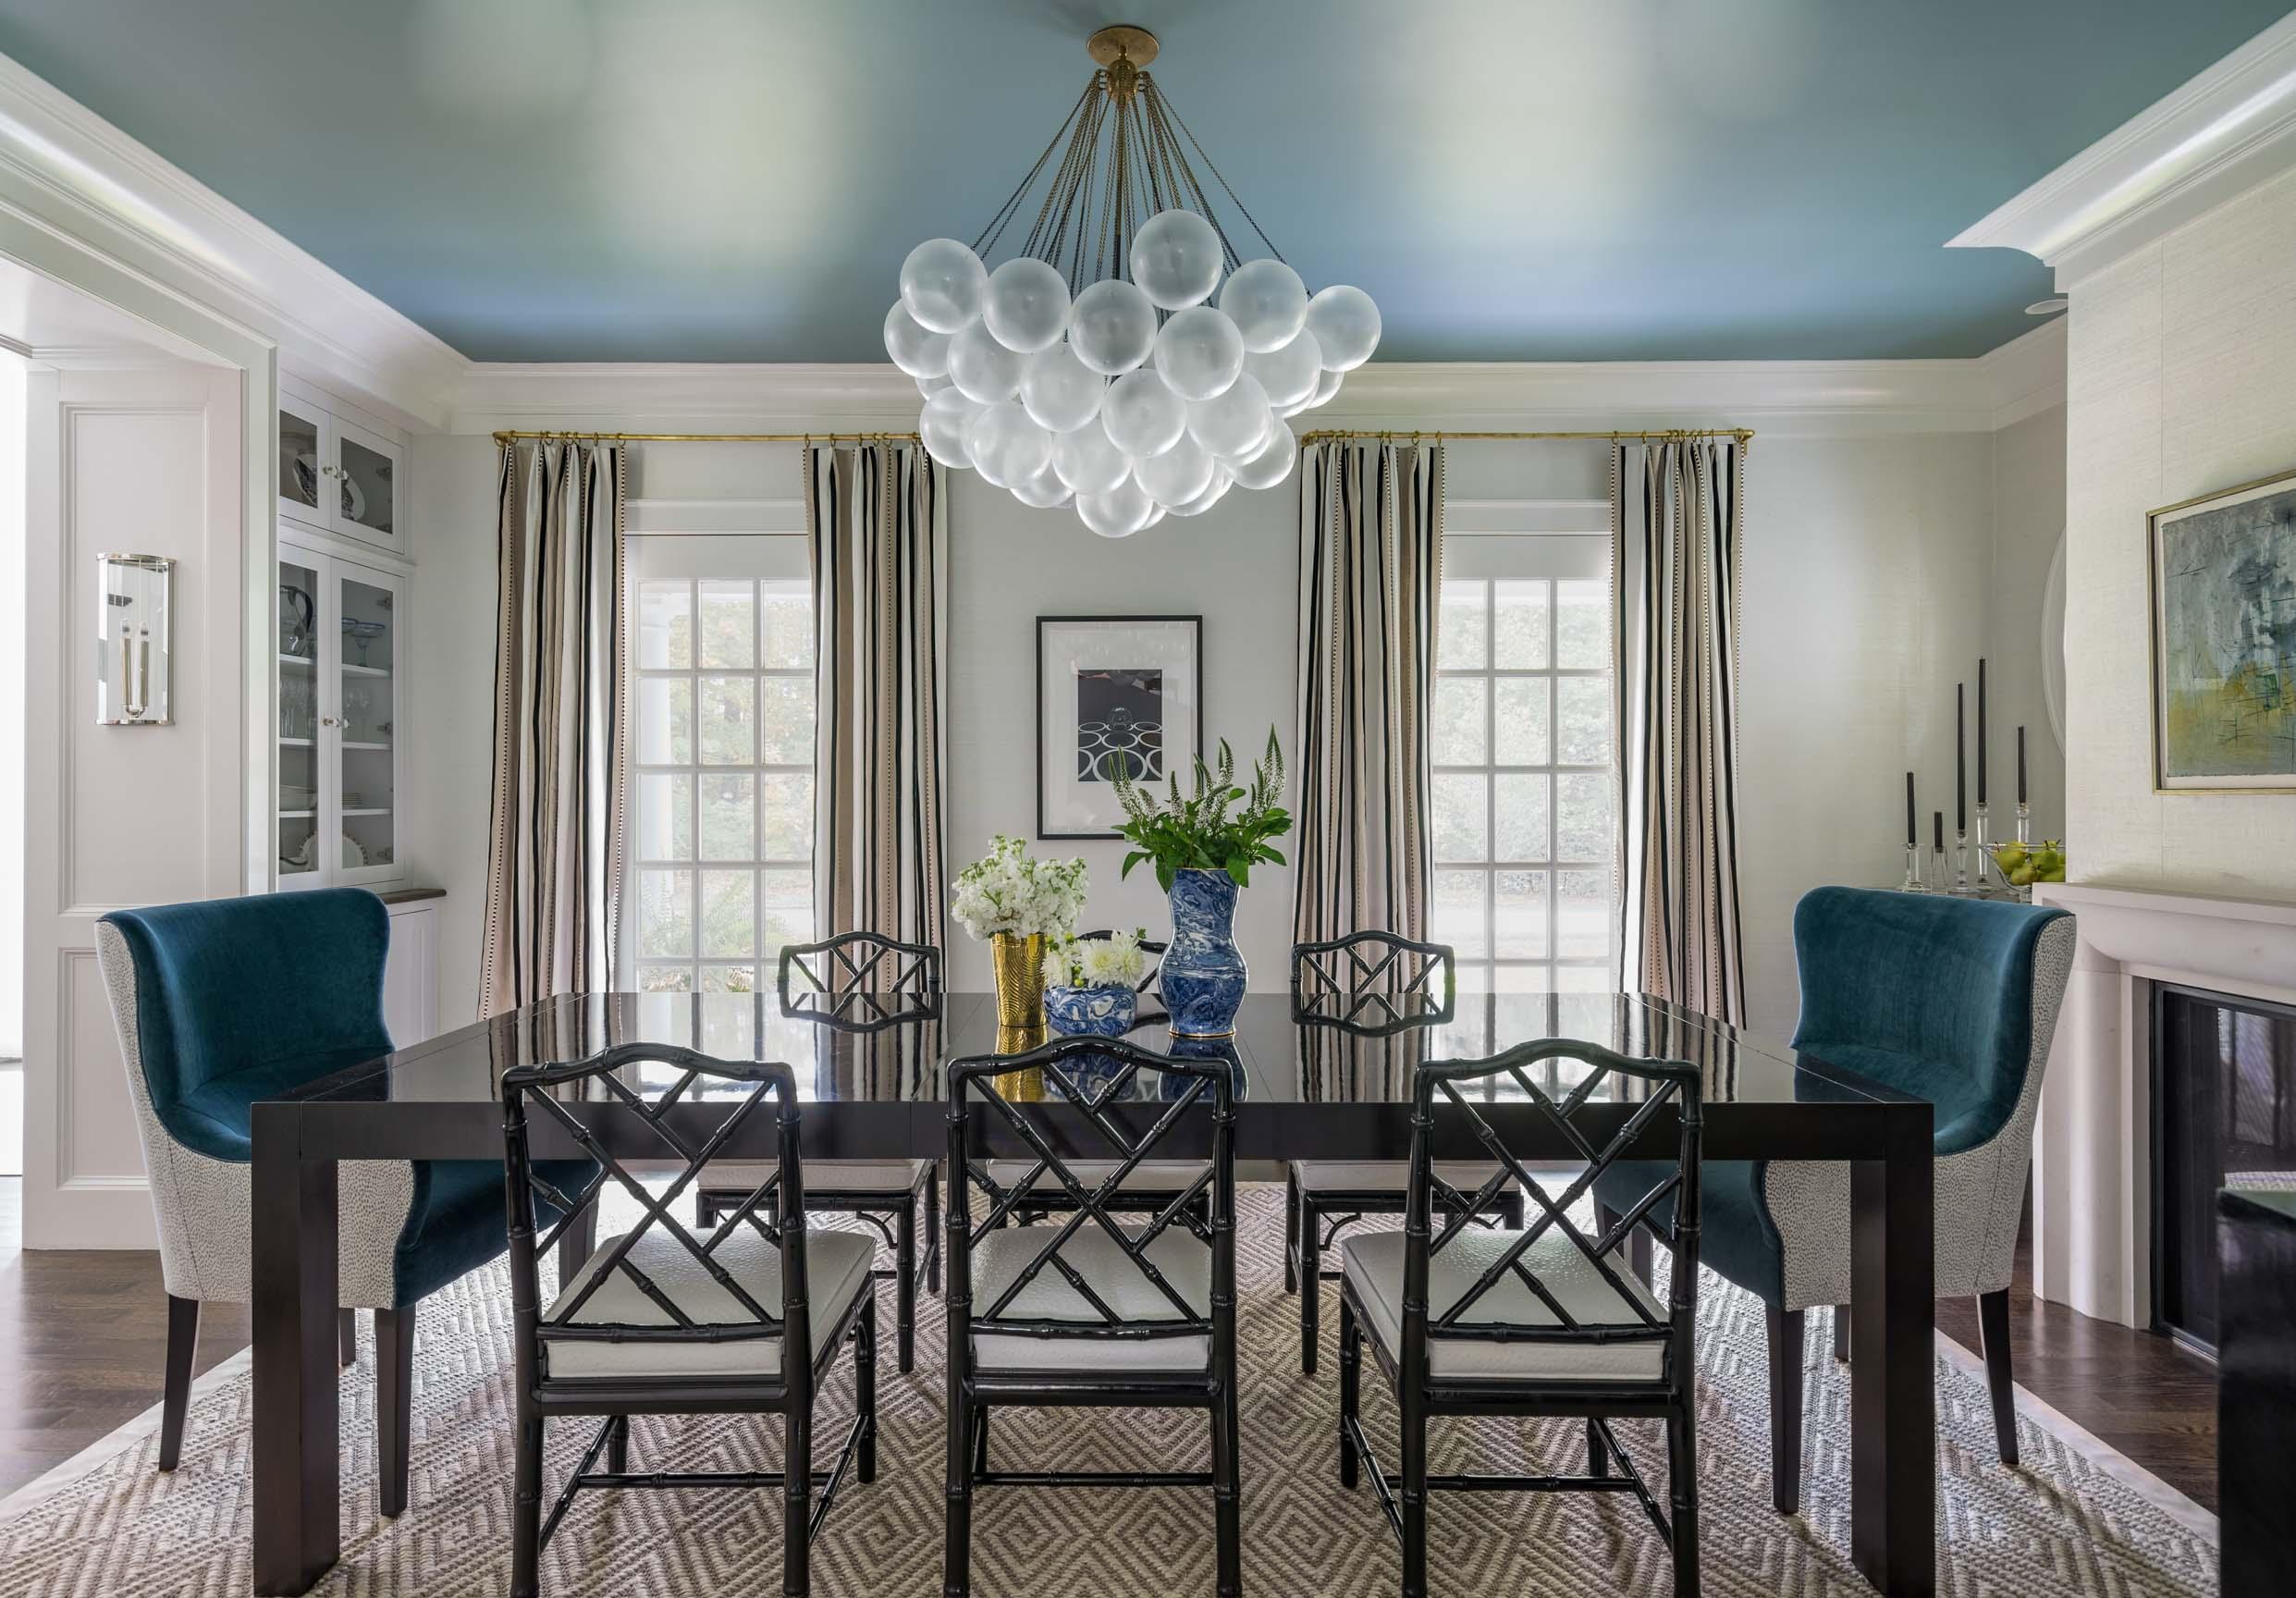 dining-room-by-liz-caan-interior-design-Dover-Dr-Wellesley